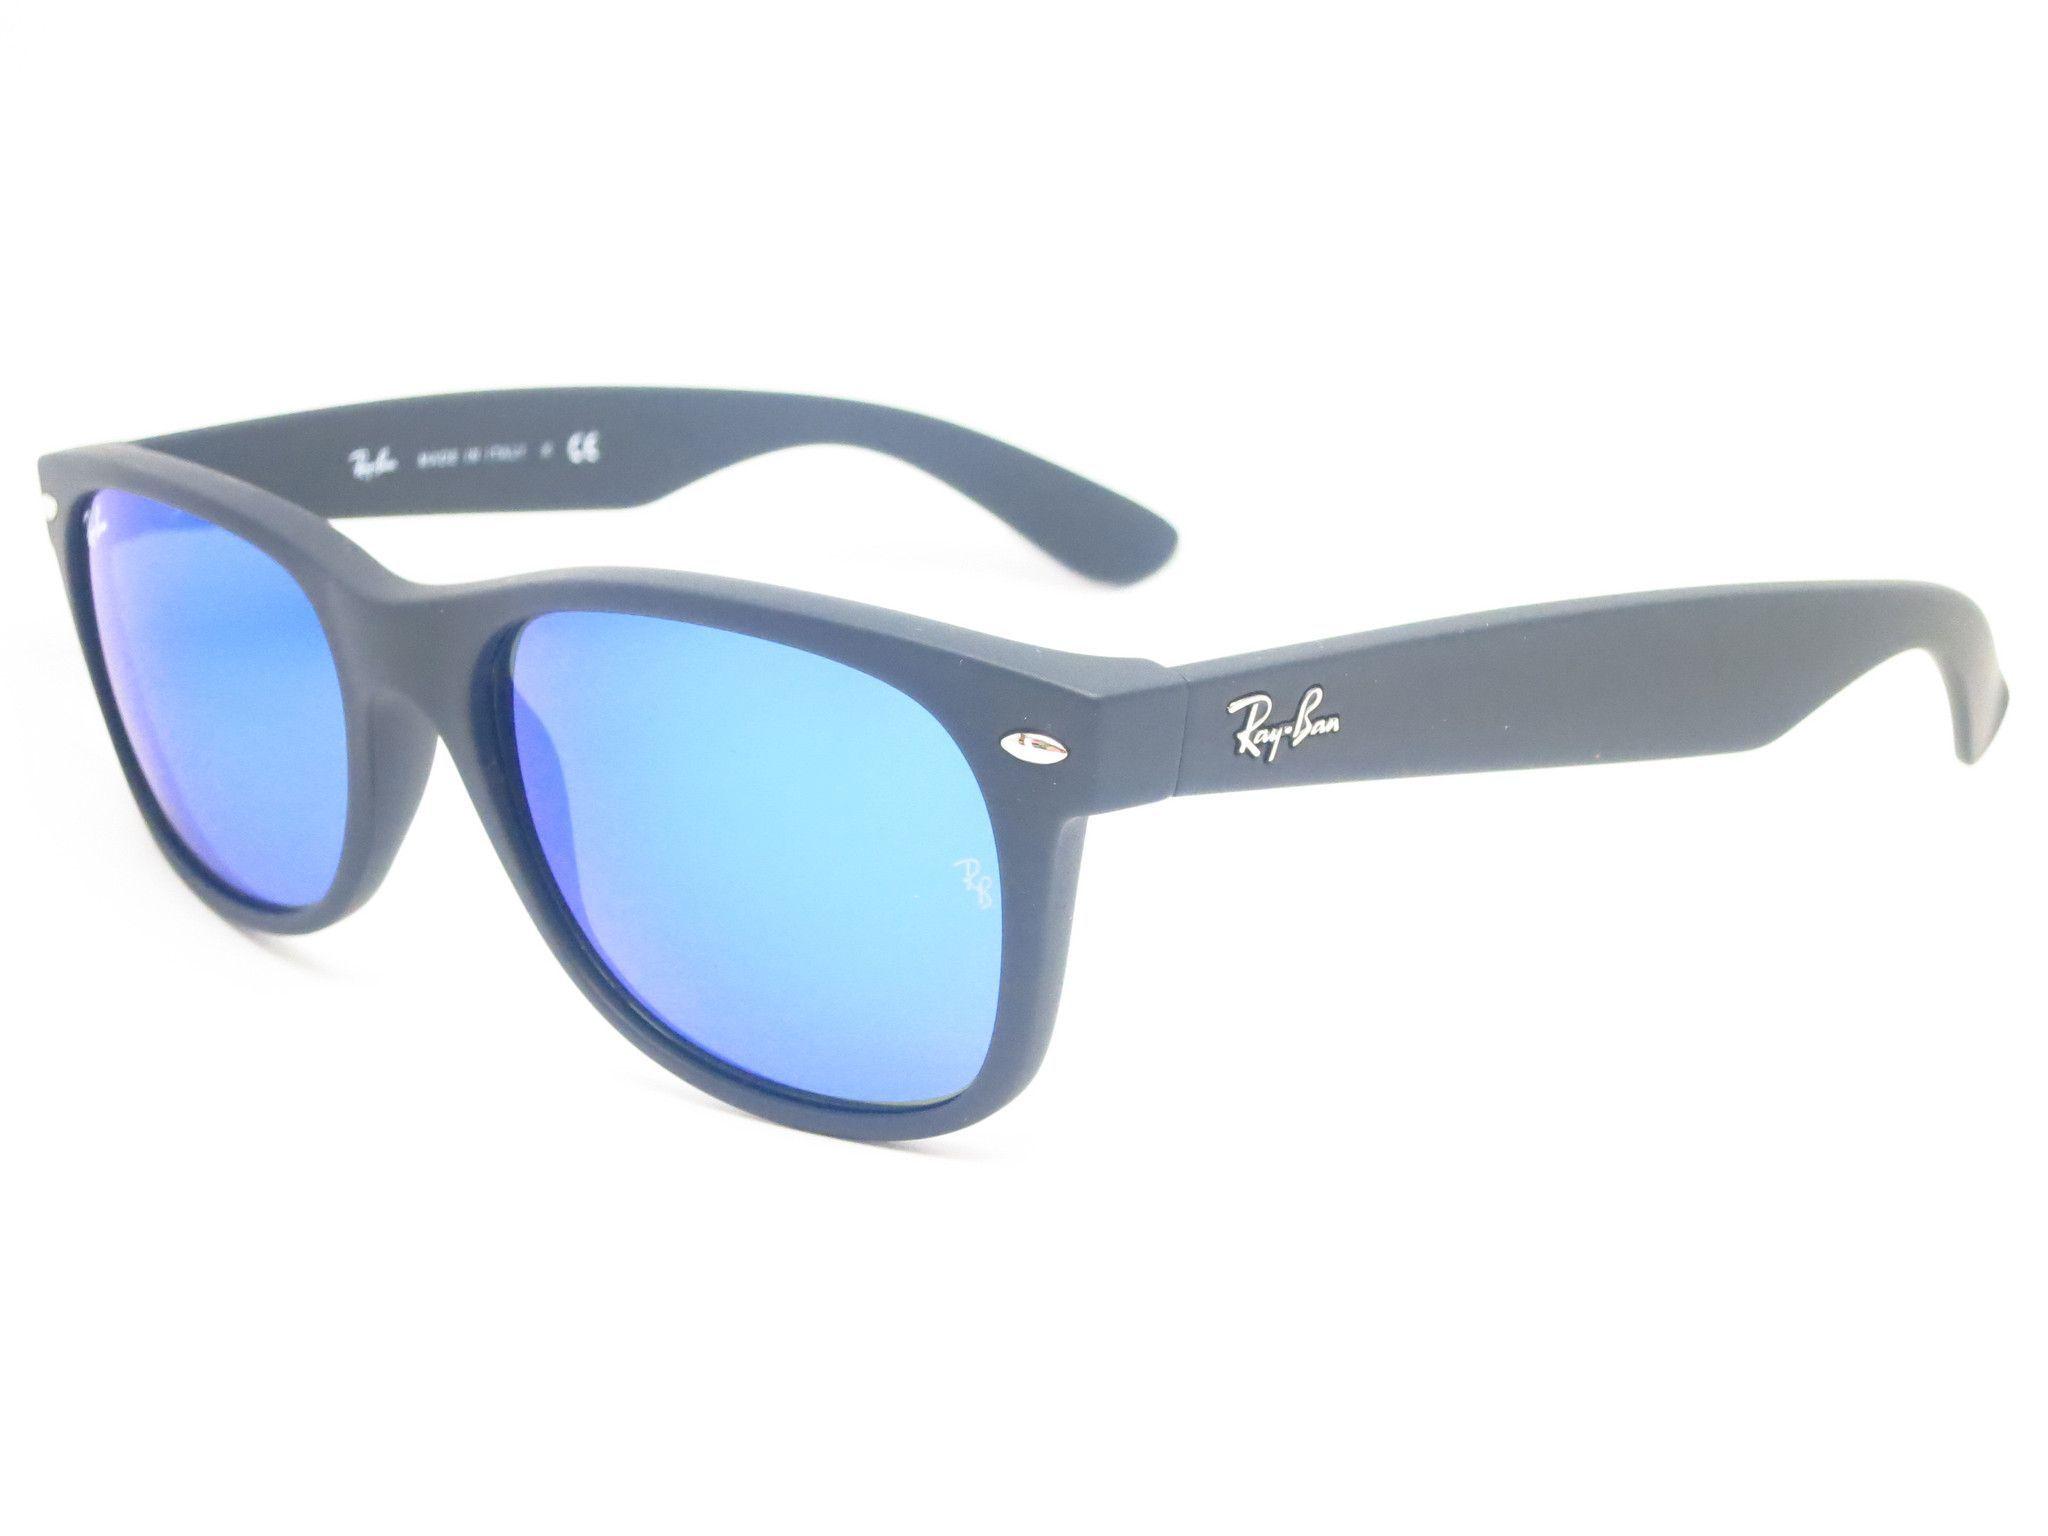 Ray-Ban RB 2132 New Wayfarer 622/17 Rubber Black Sunglasses   Pinterest